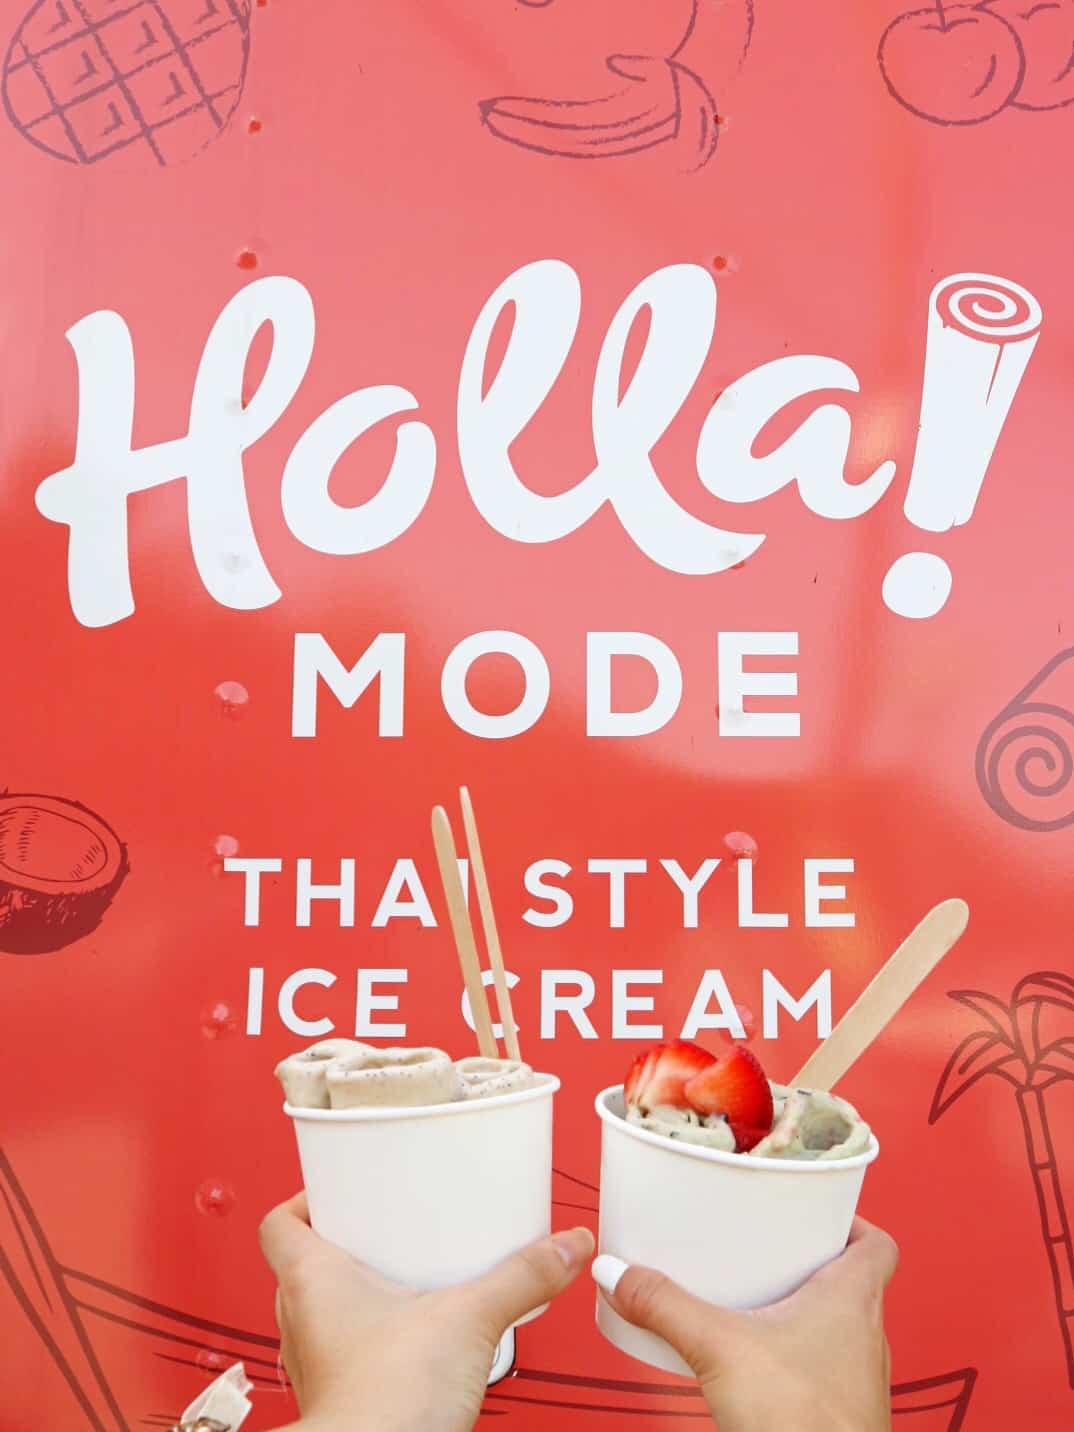 Holla Mode